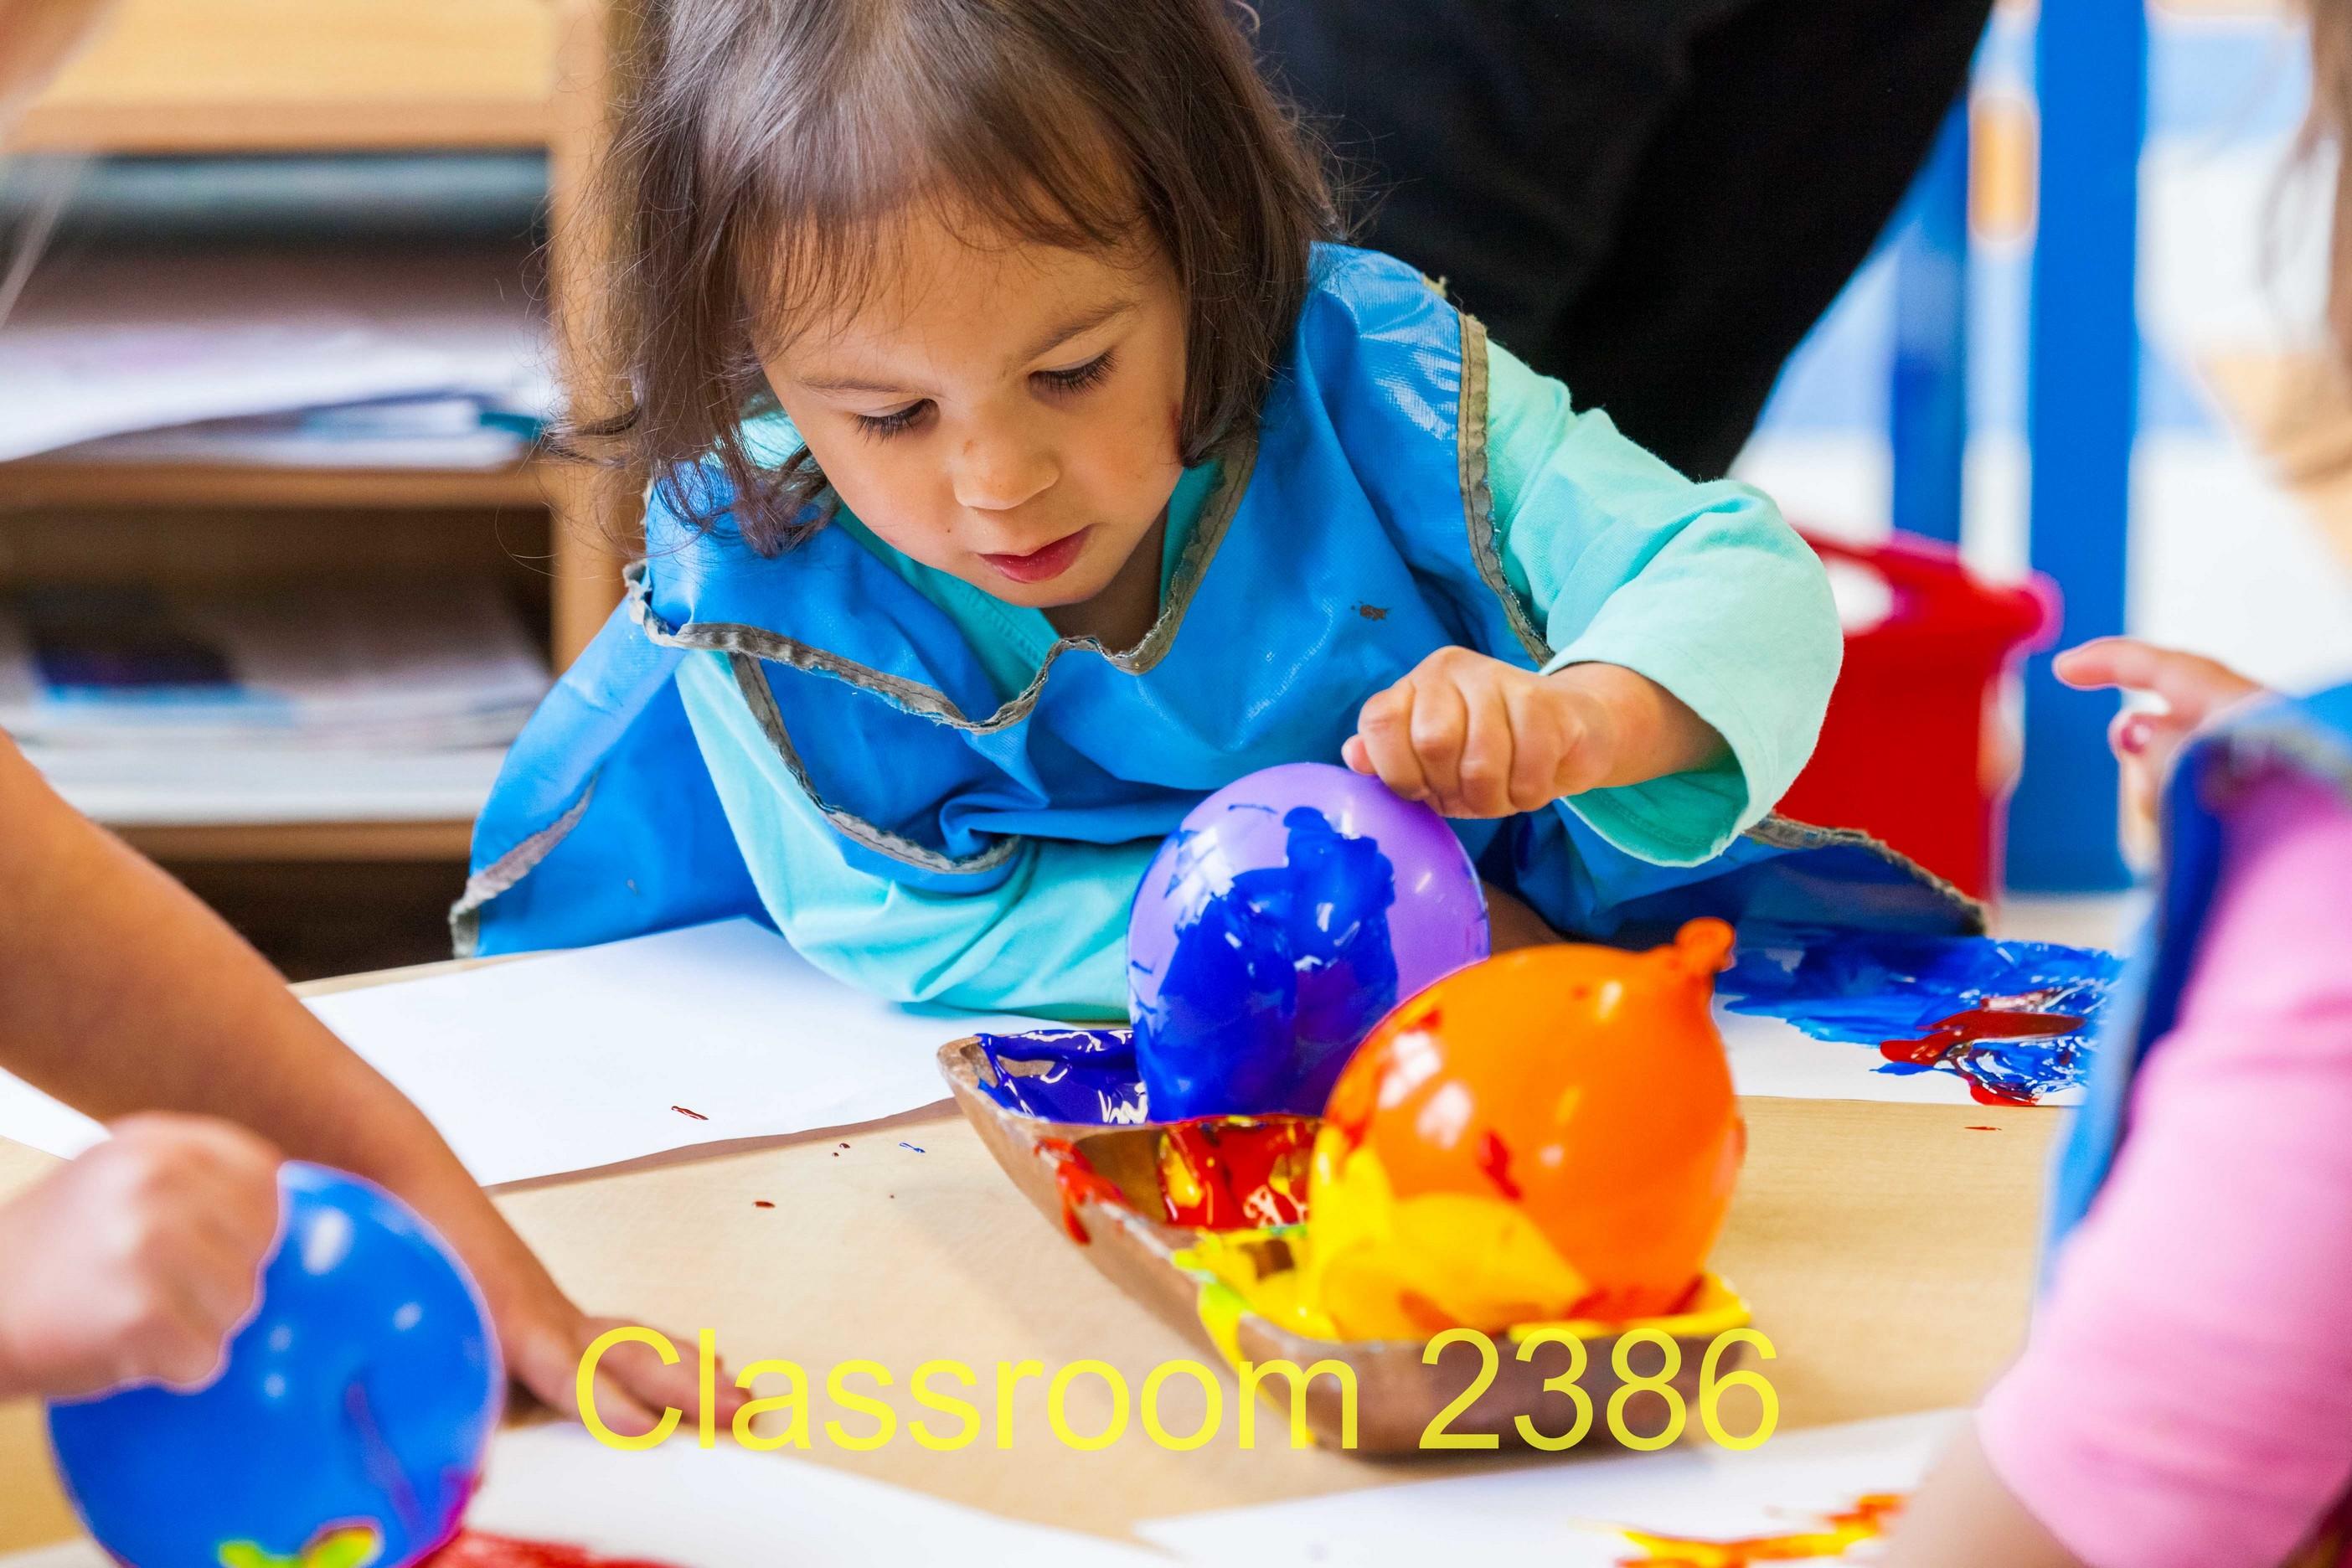 Classroom 2386